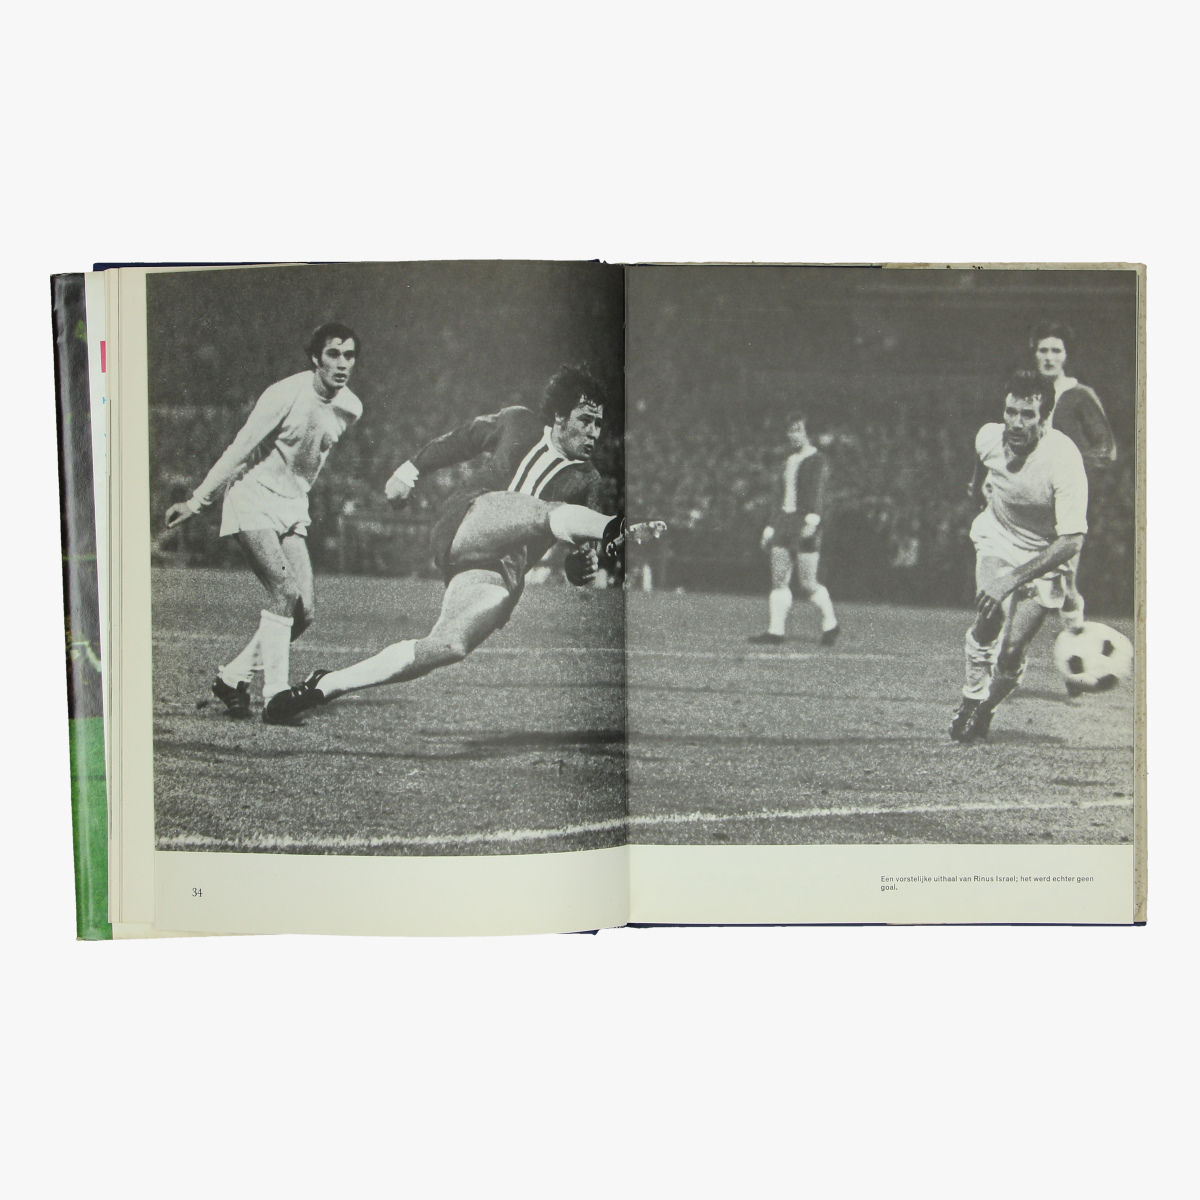 Afbeeldingen van voetbal boek europacup XVII herman kuiphof 1970/71 uitgeverij luitingh-laren n.h